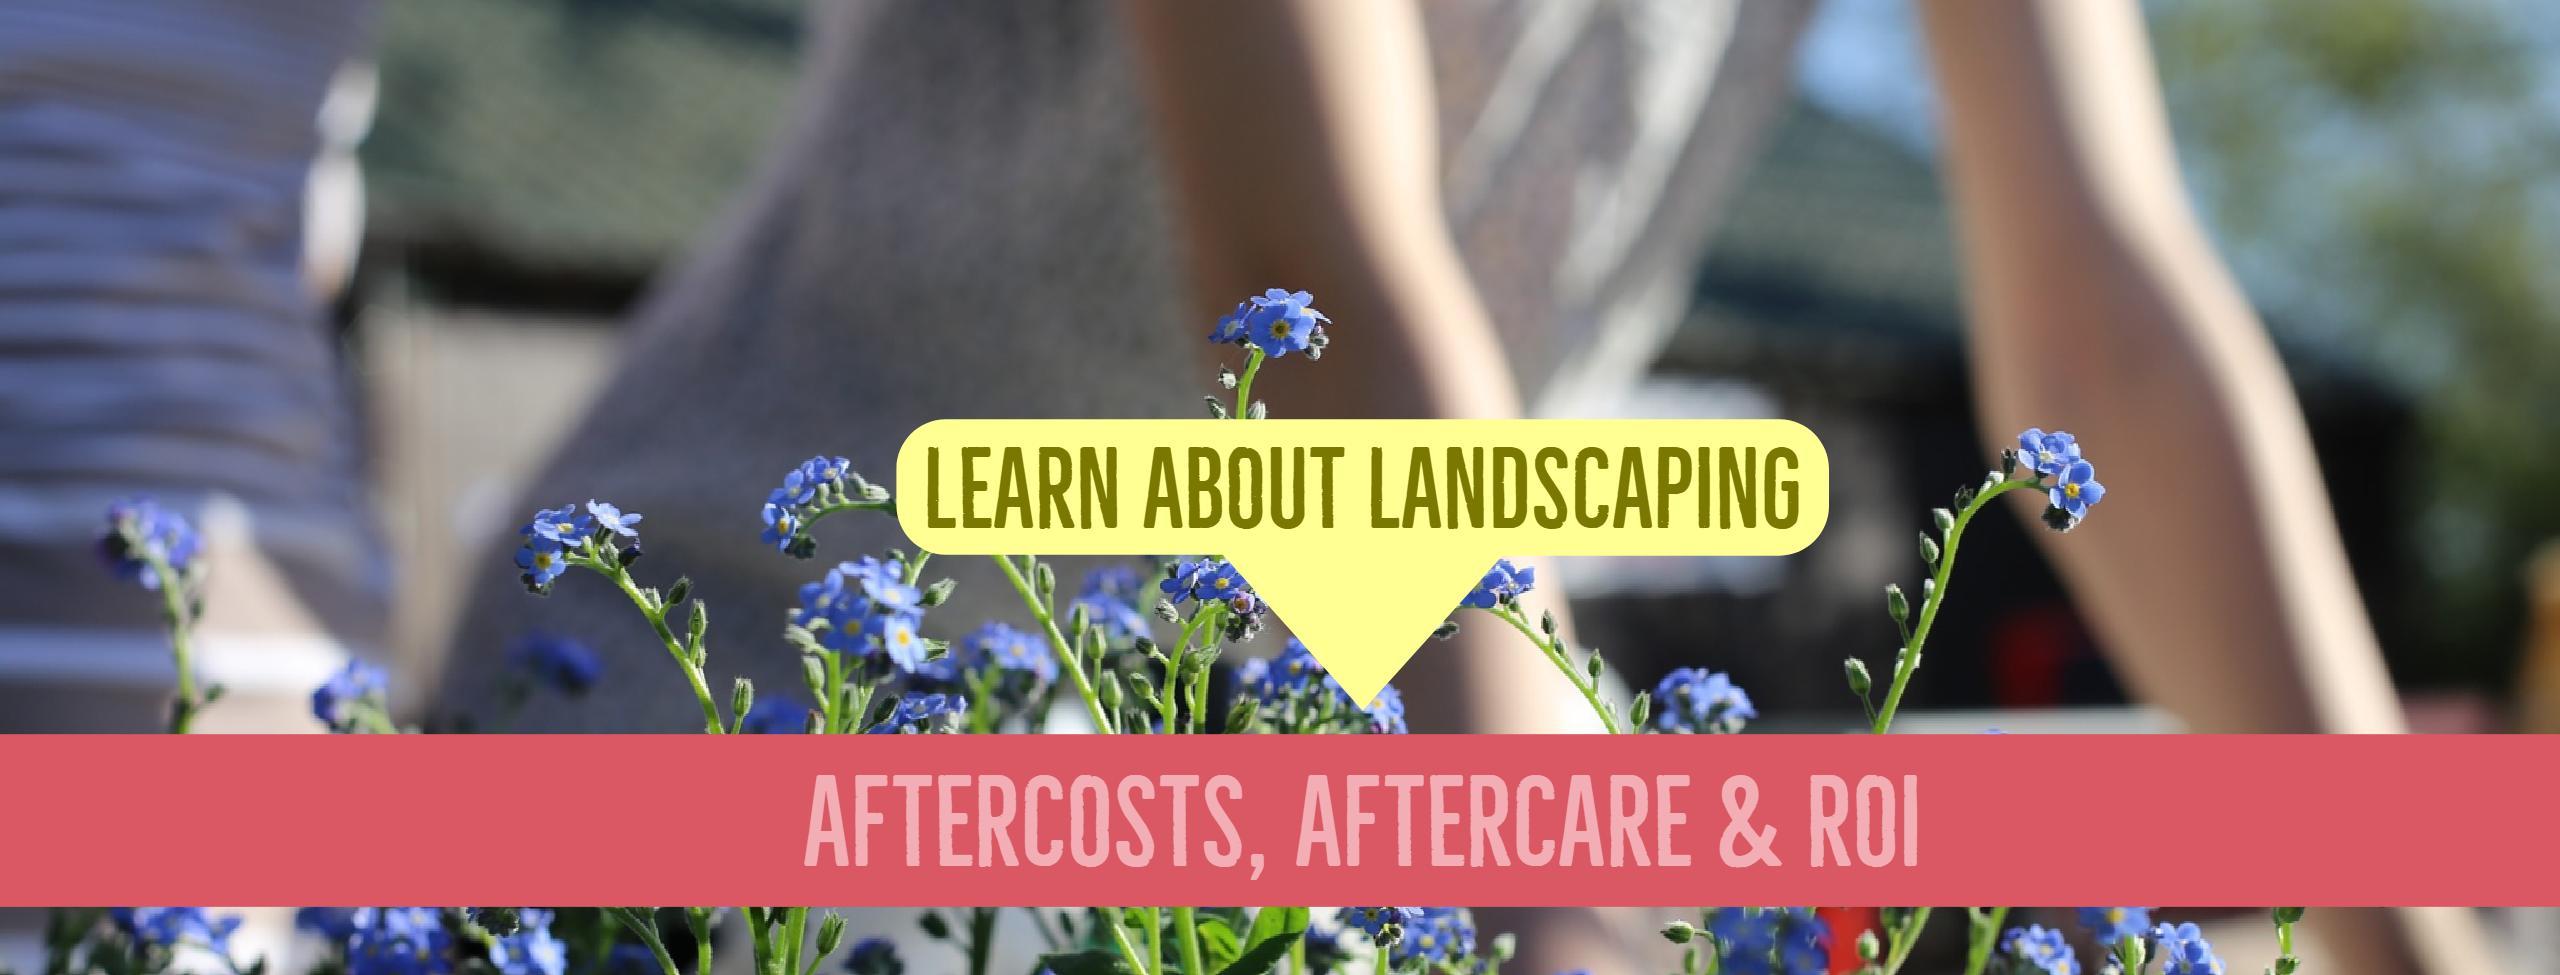 Anne Roberts Gardens hire-a-landscaper-3